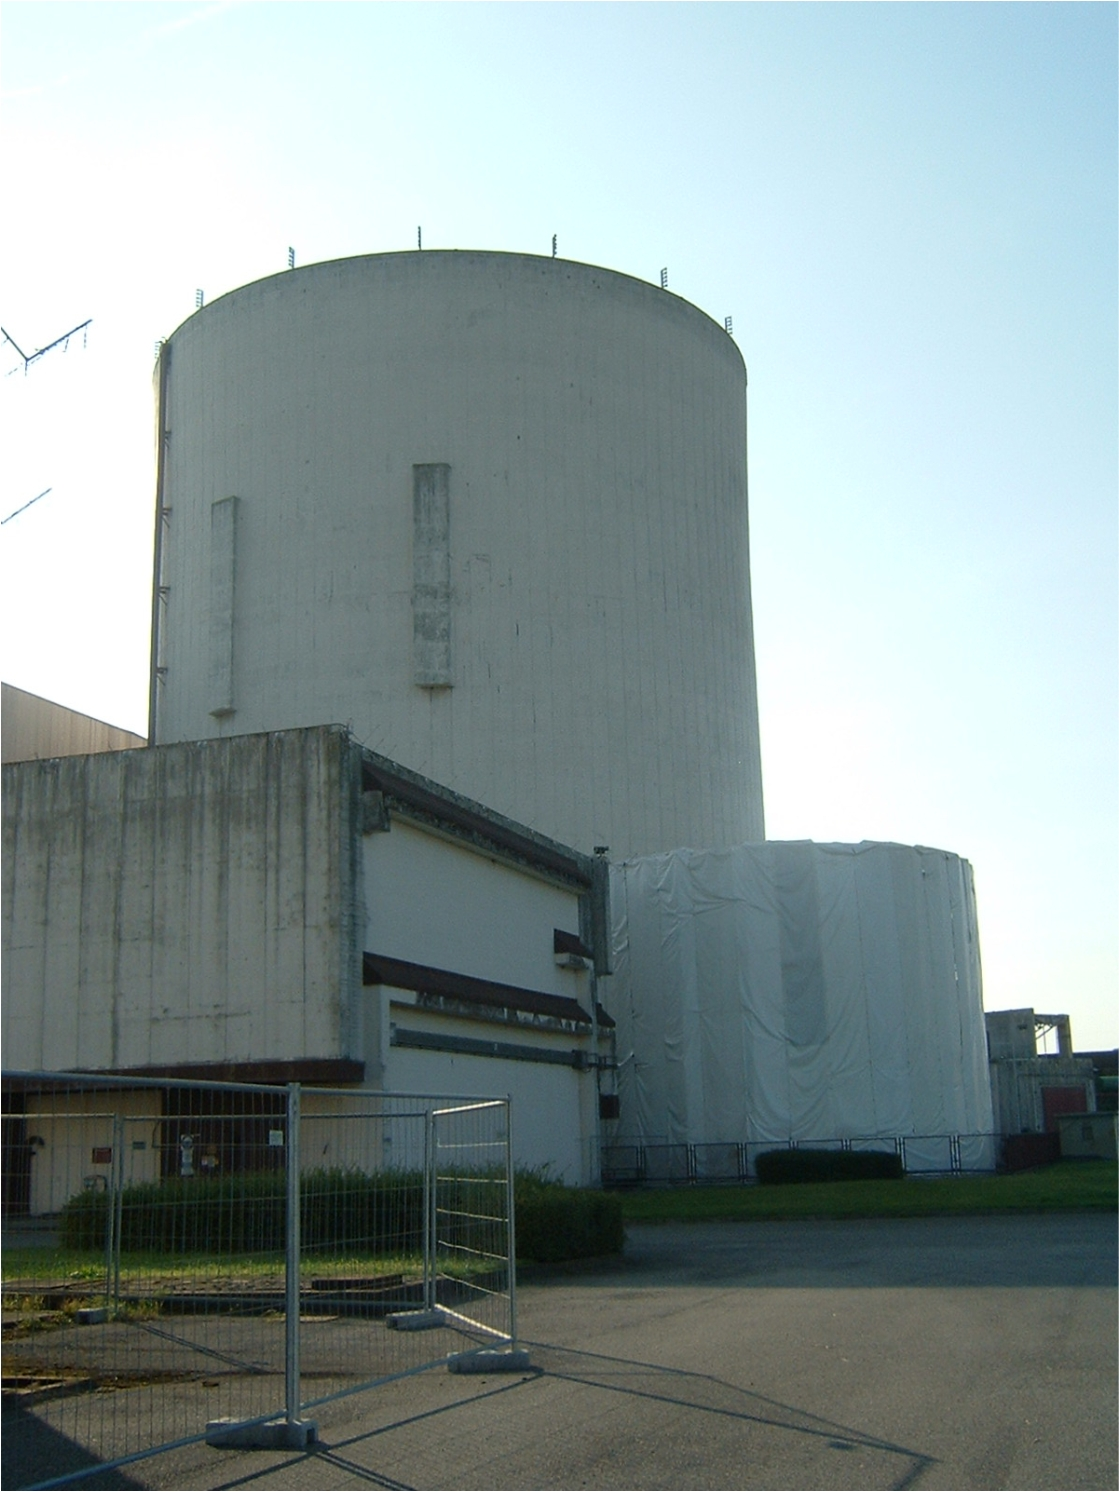 Centrale nucleare a Caorso (PC)